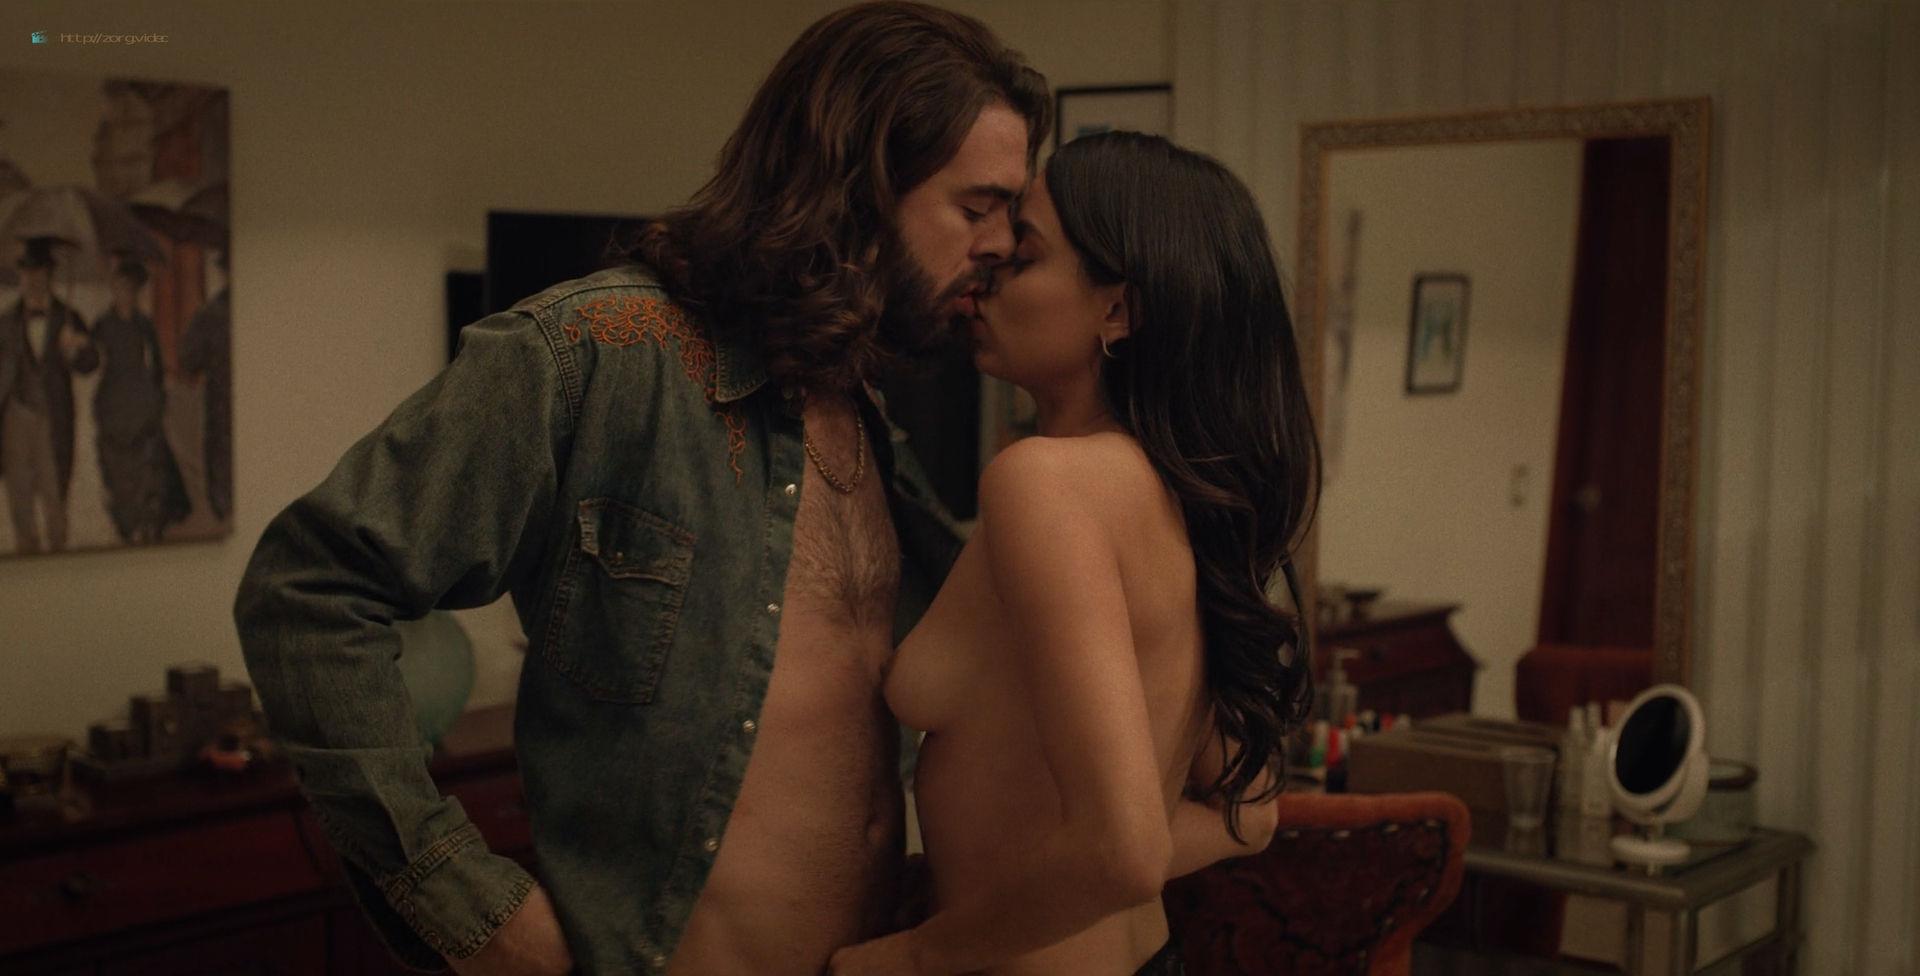 Ana Layevska nude lesbian sex with Florencia Ríos - Yankee (2019) S1 HD 1080p (8)